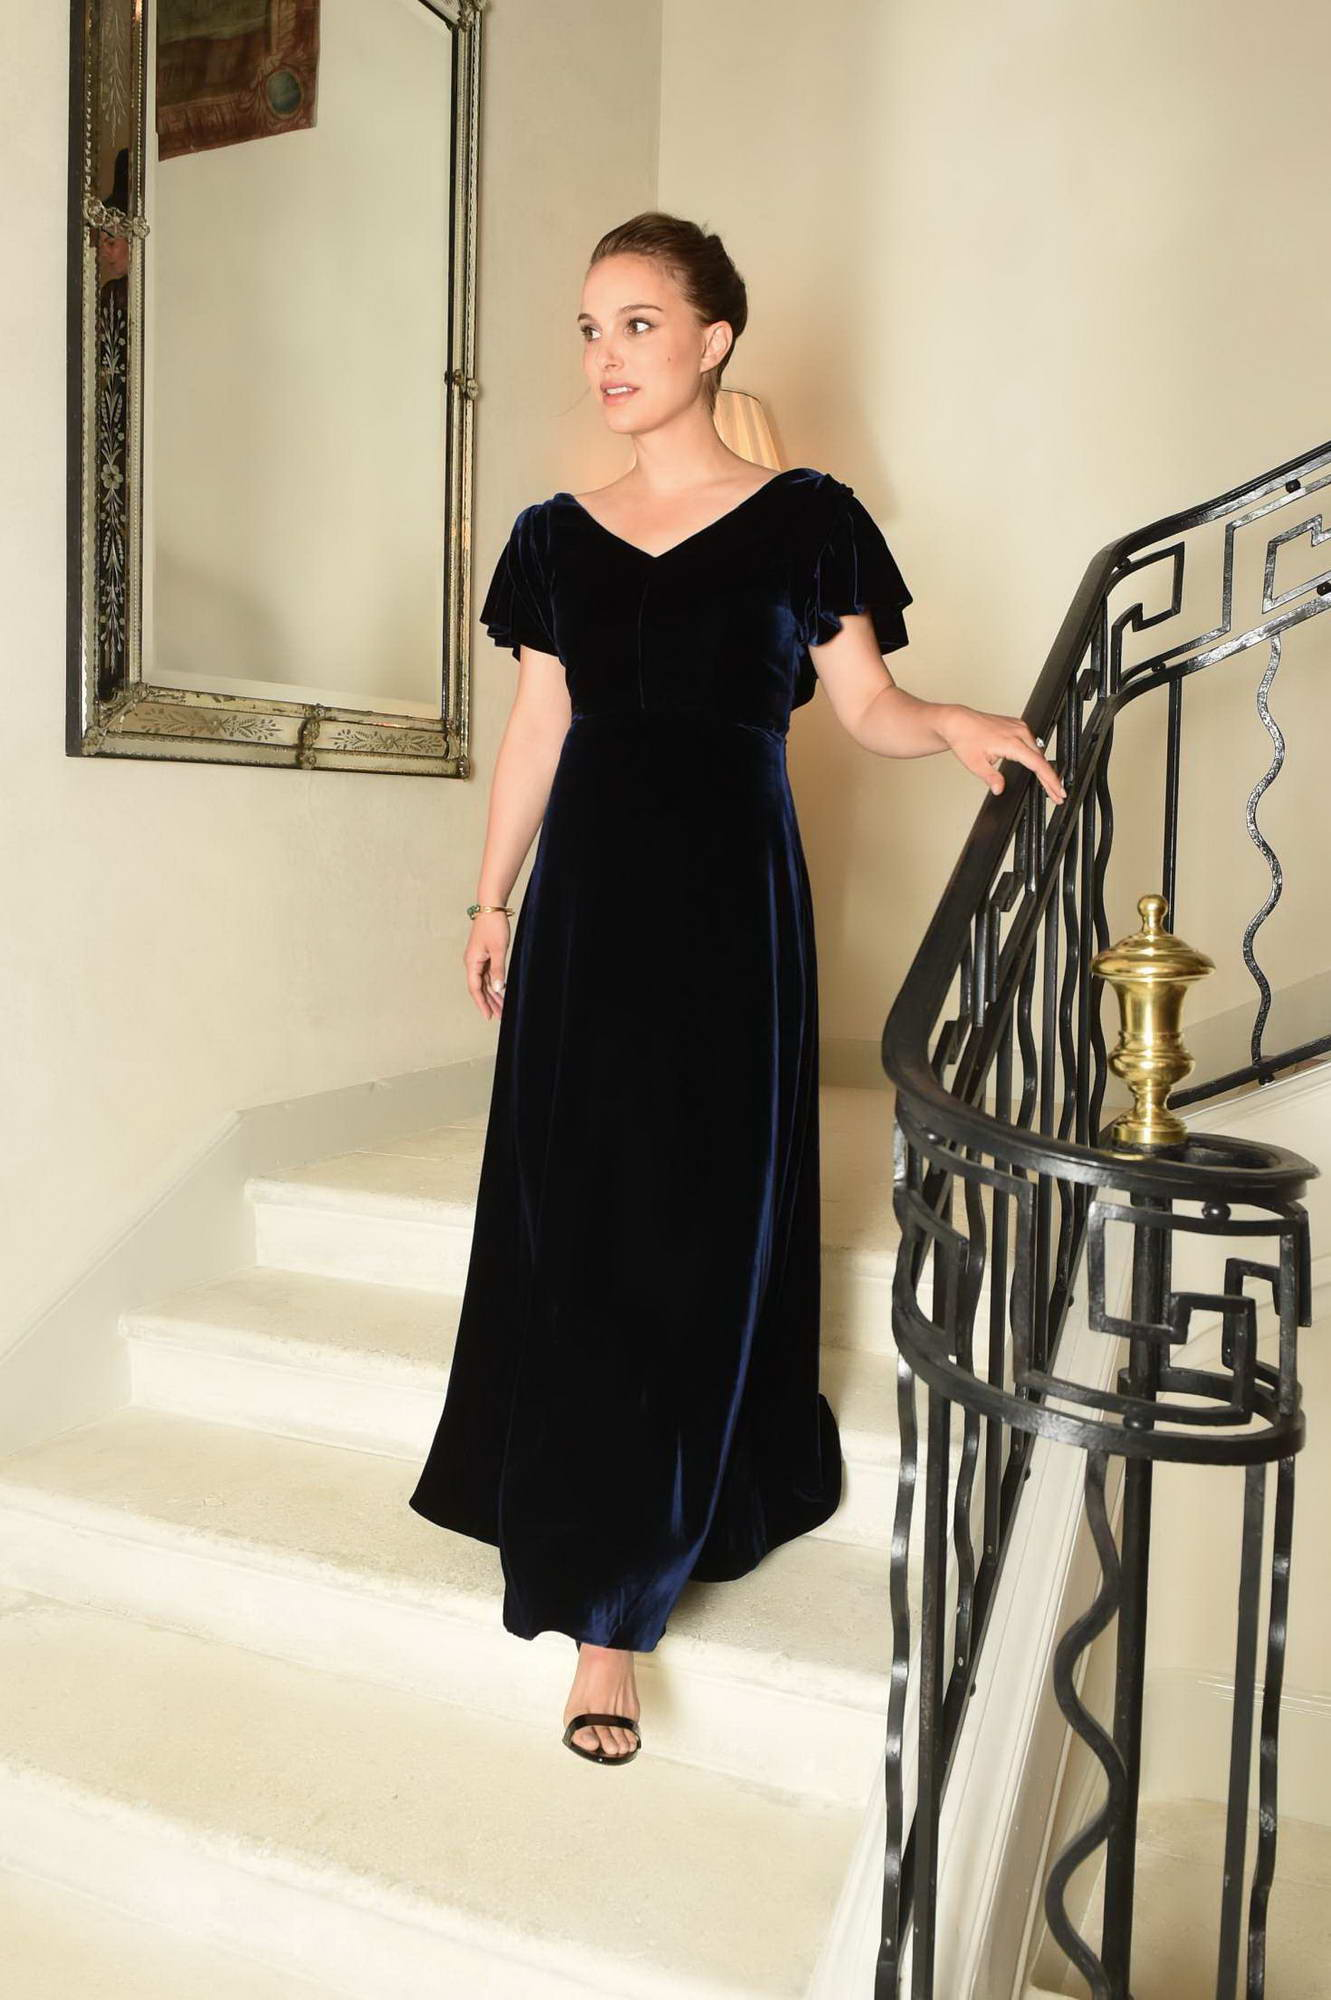 La Colle Noire Dior natalie portman attending the christian dior dinner at